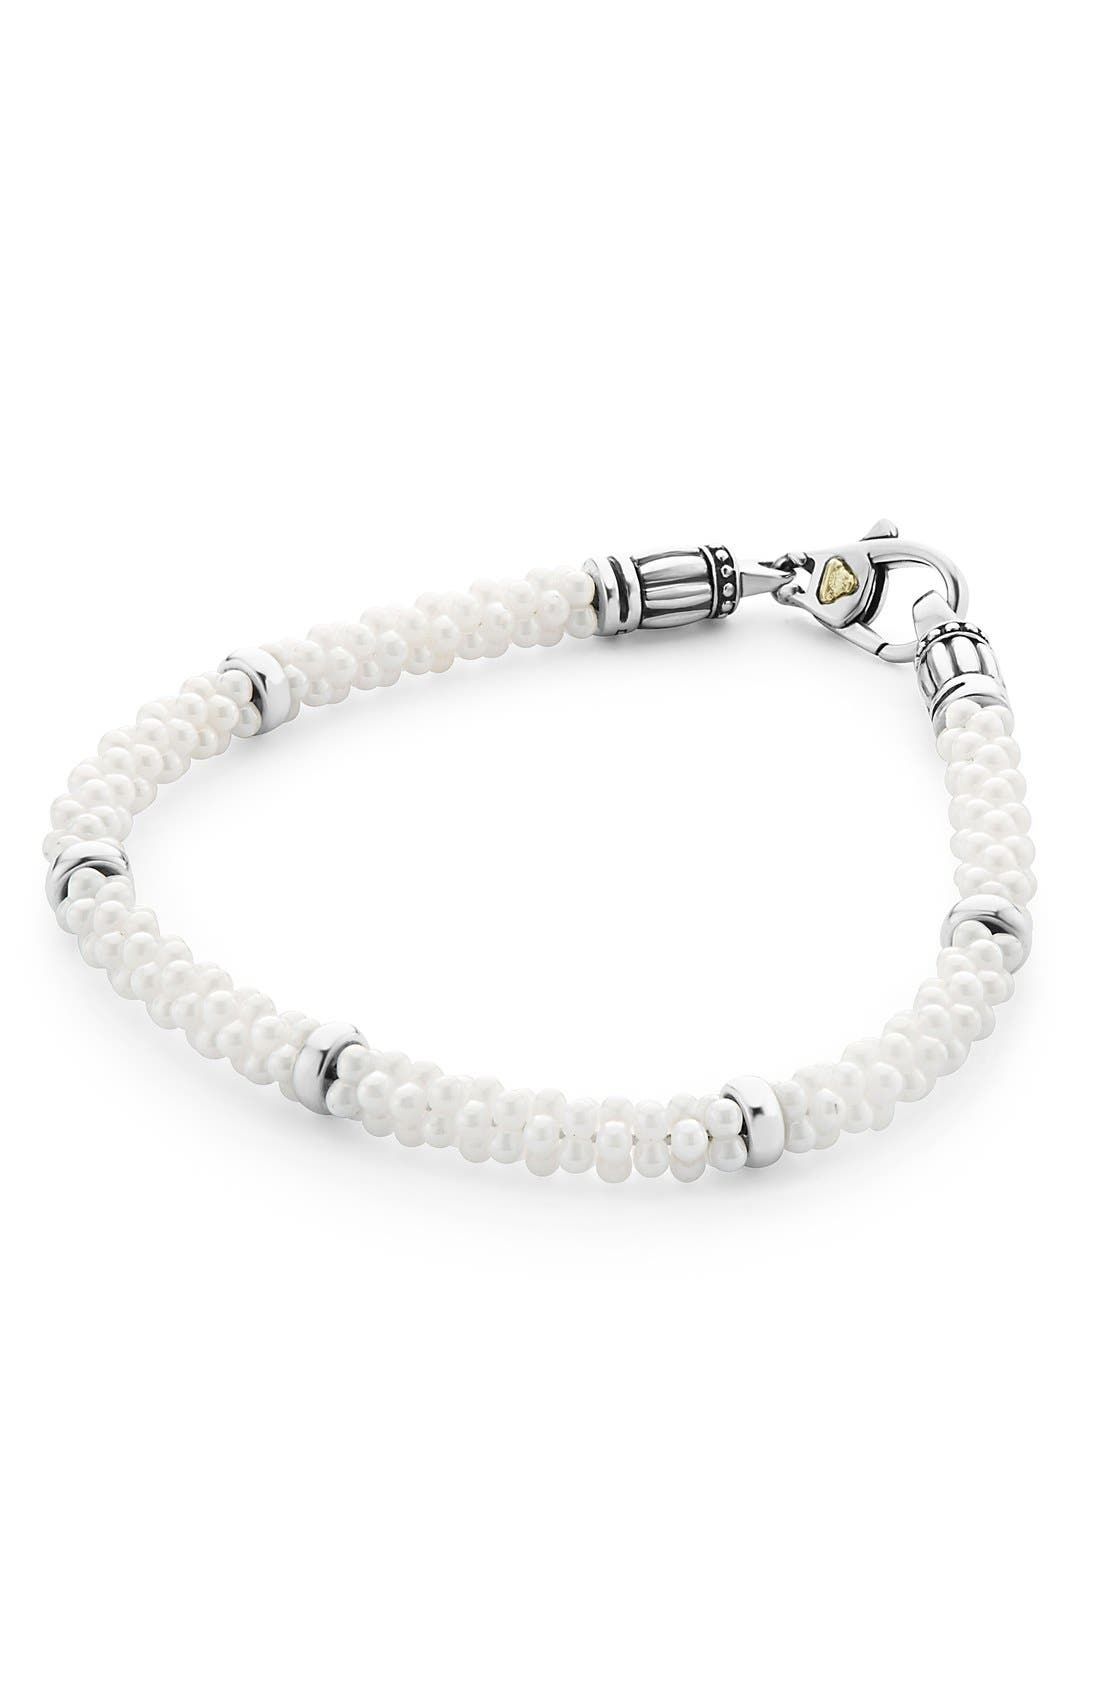 Main Image - LAGOS 'Black & White Caviar' Bracelet